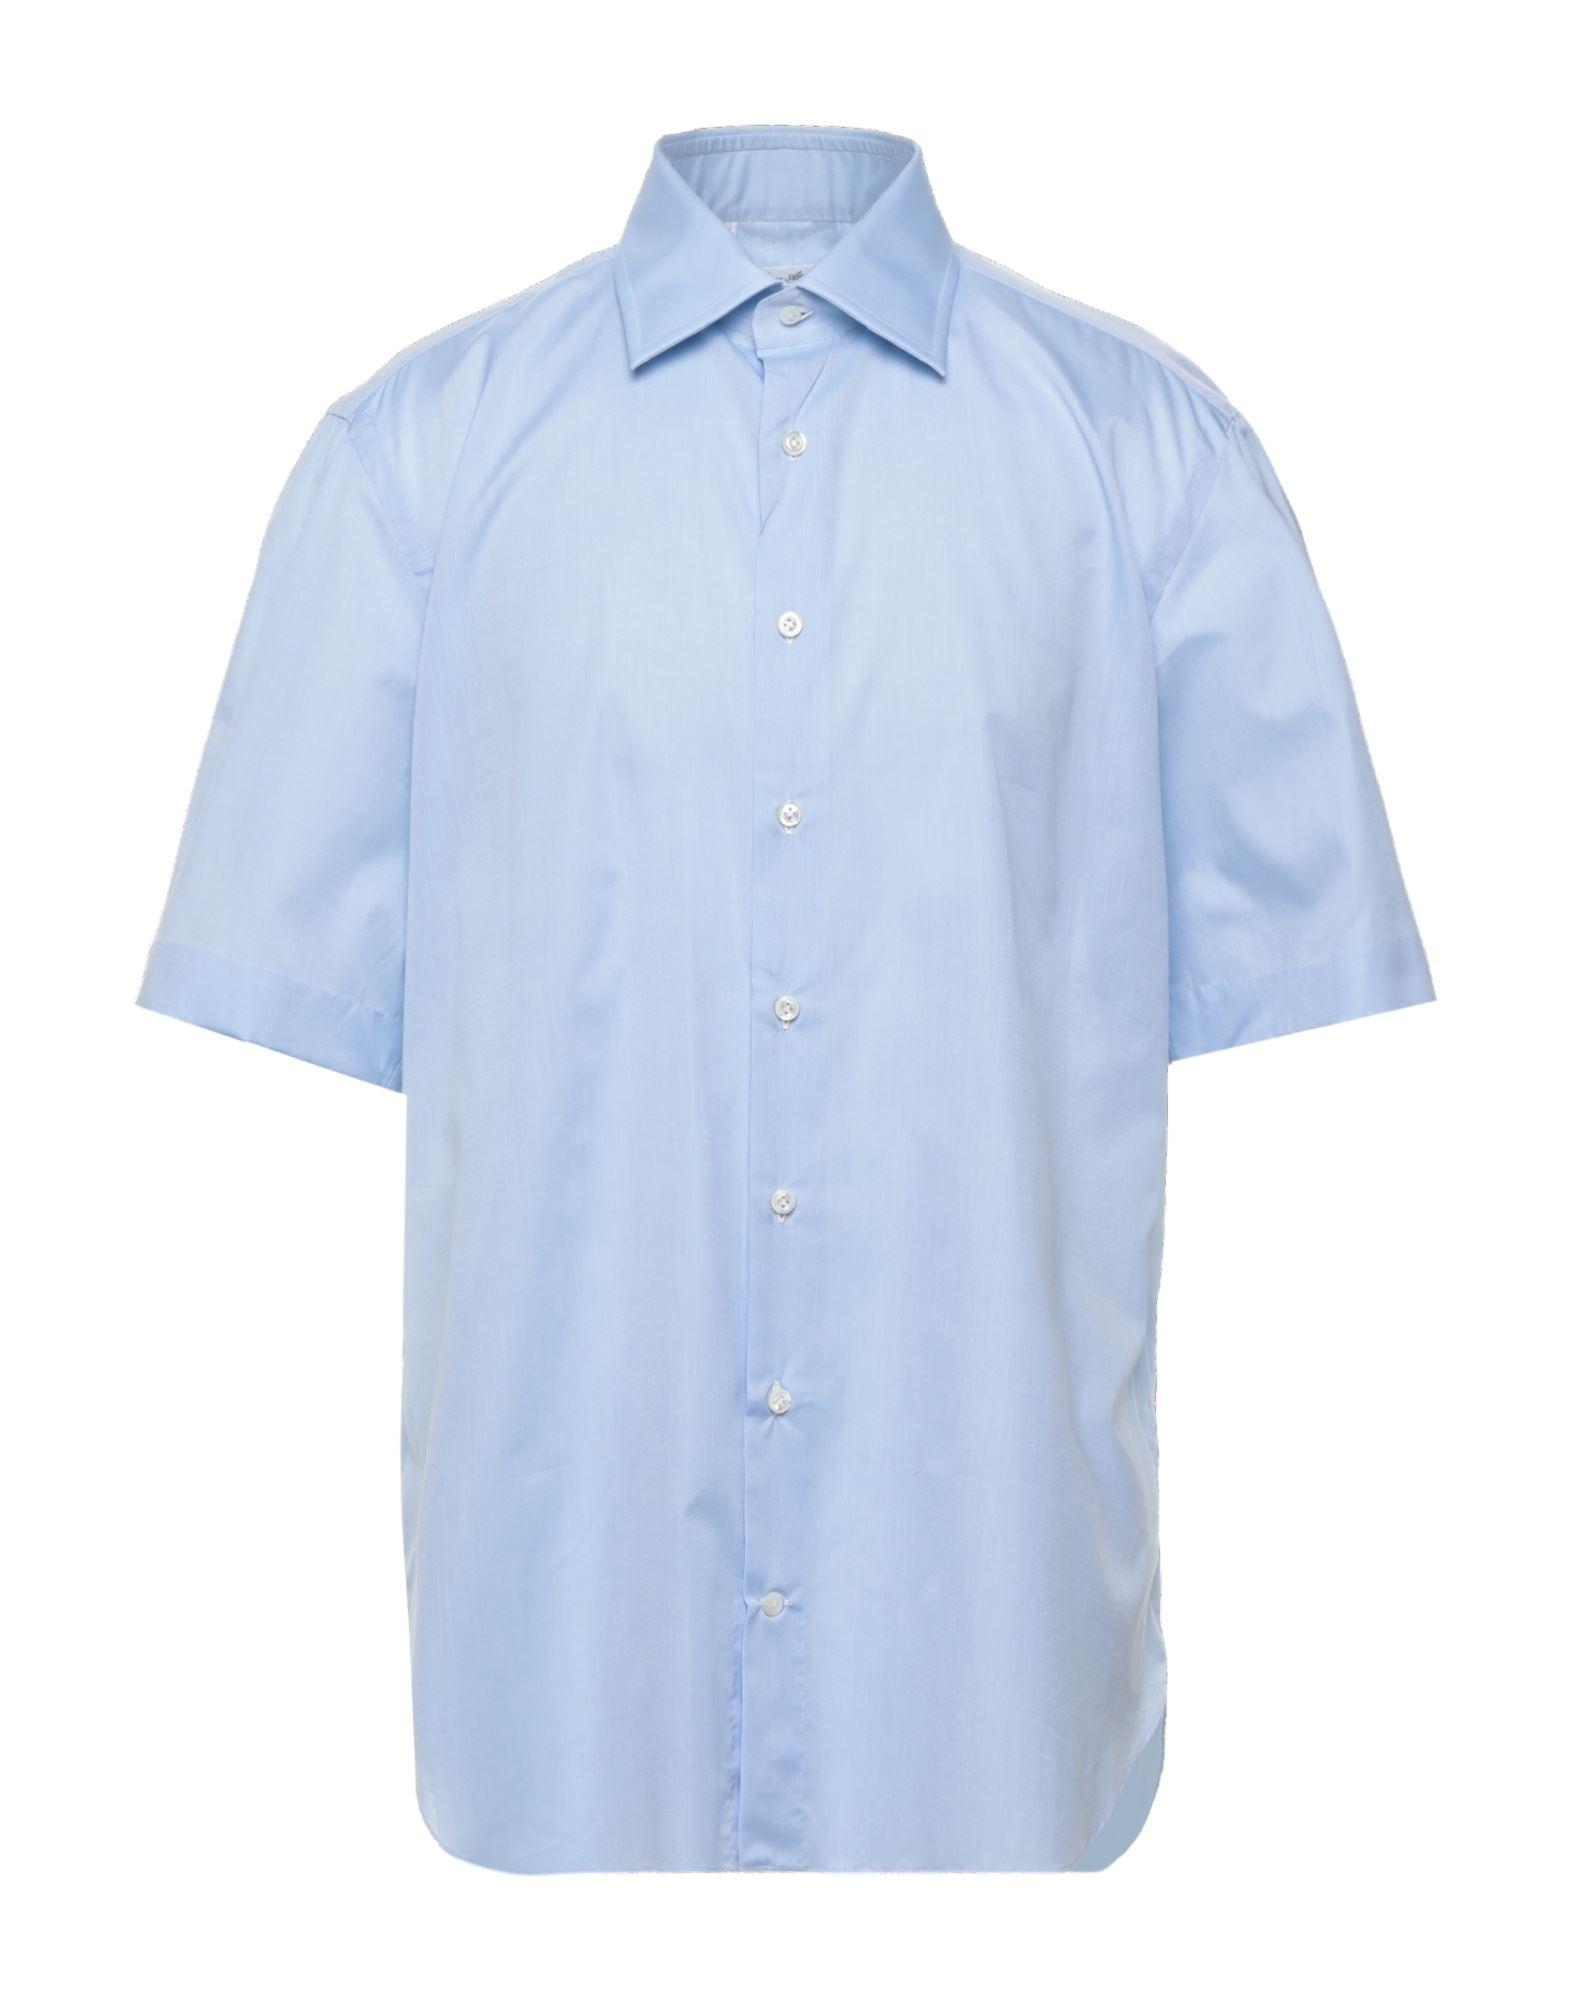 Фото - CESARE ATTOLINI Pубашка cesare attolini pубашка